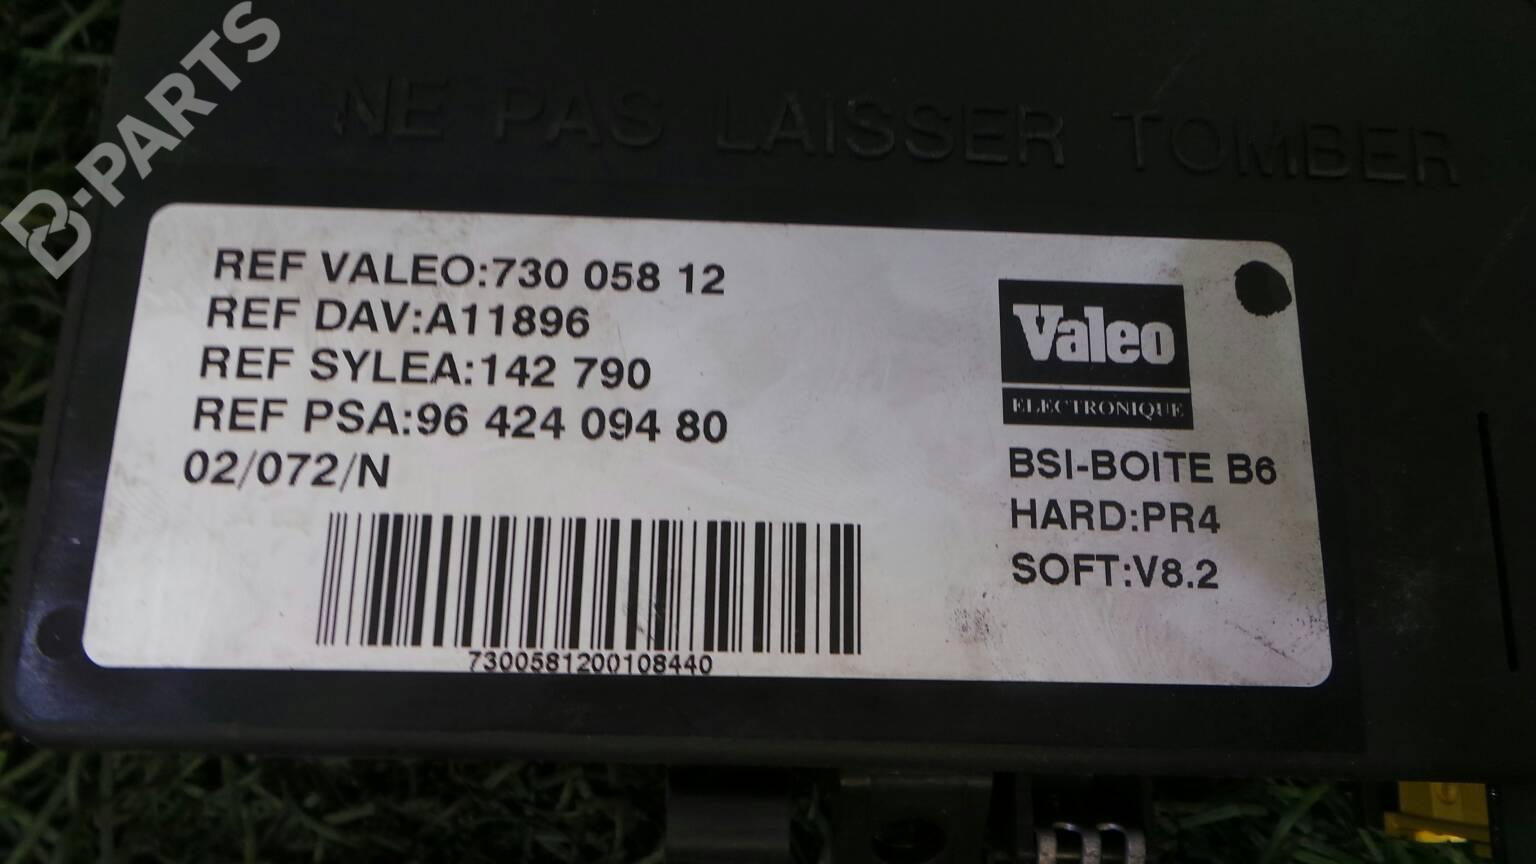 Fuse Box 96 424 094 80 CITROËN, XSARA (N1) 2.0 HDi 90( ...